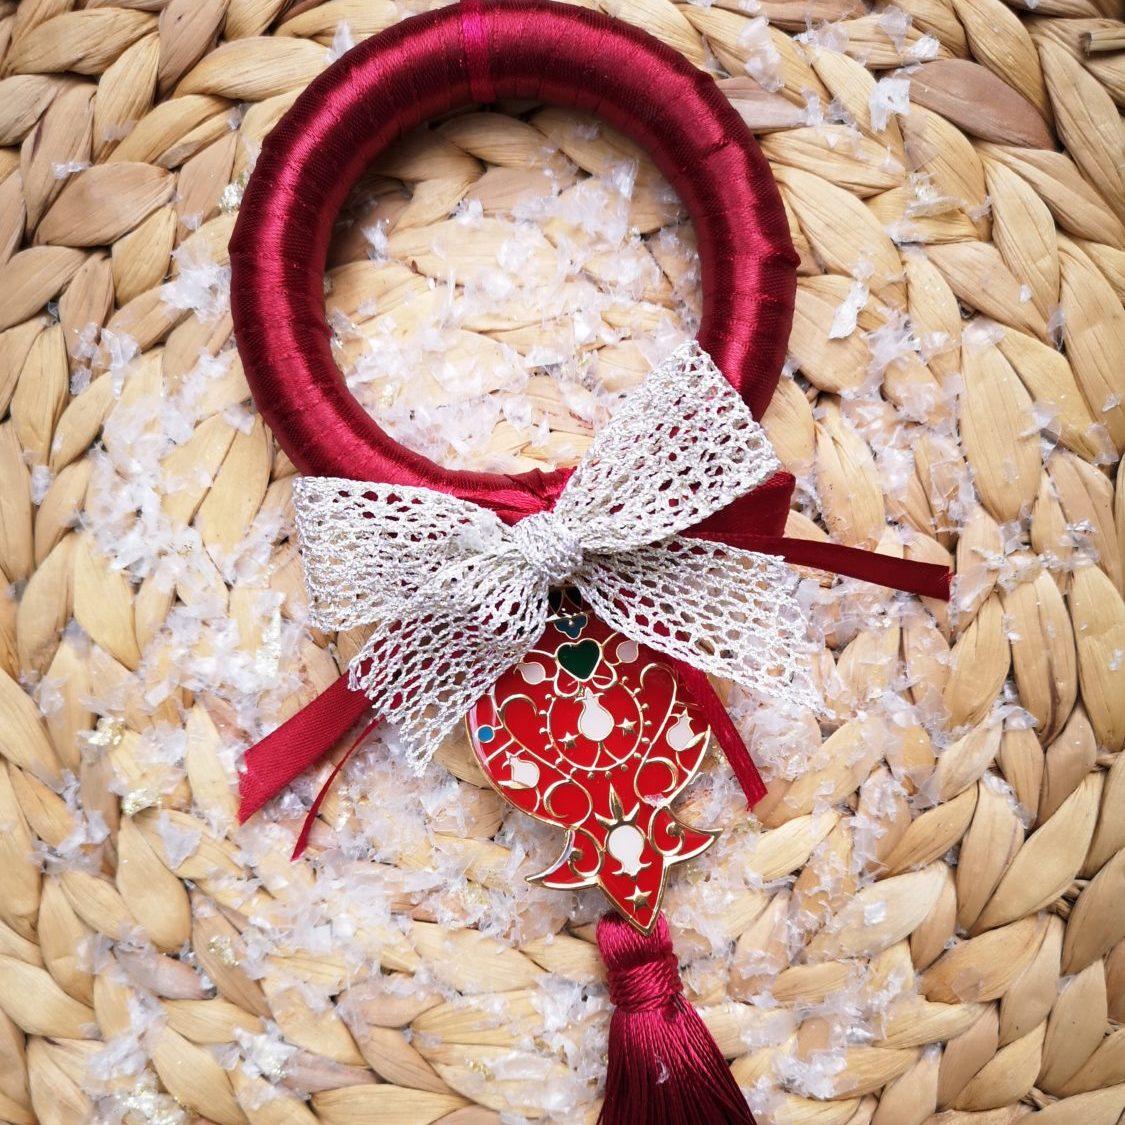 Red wreath charm